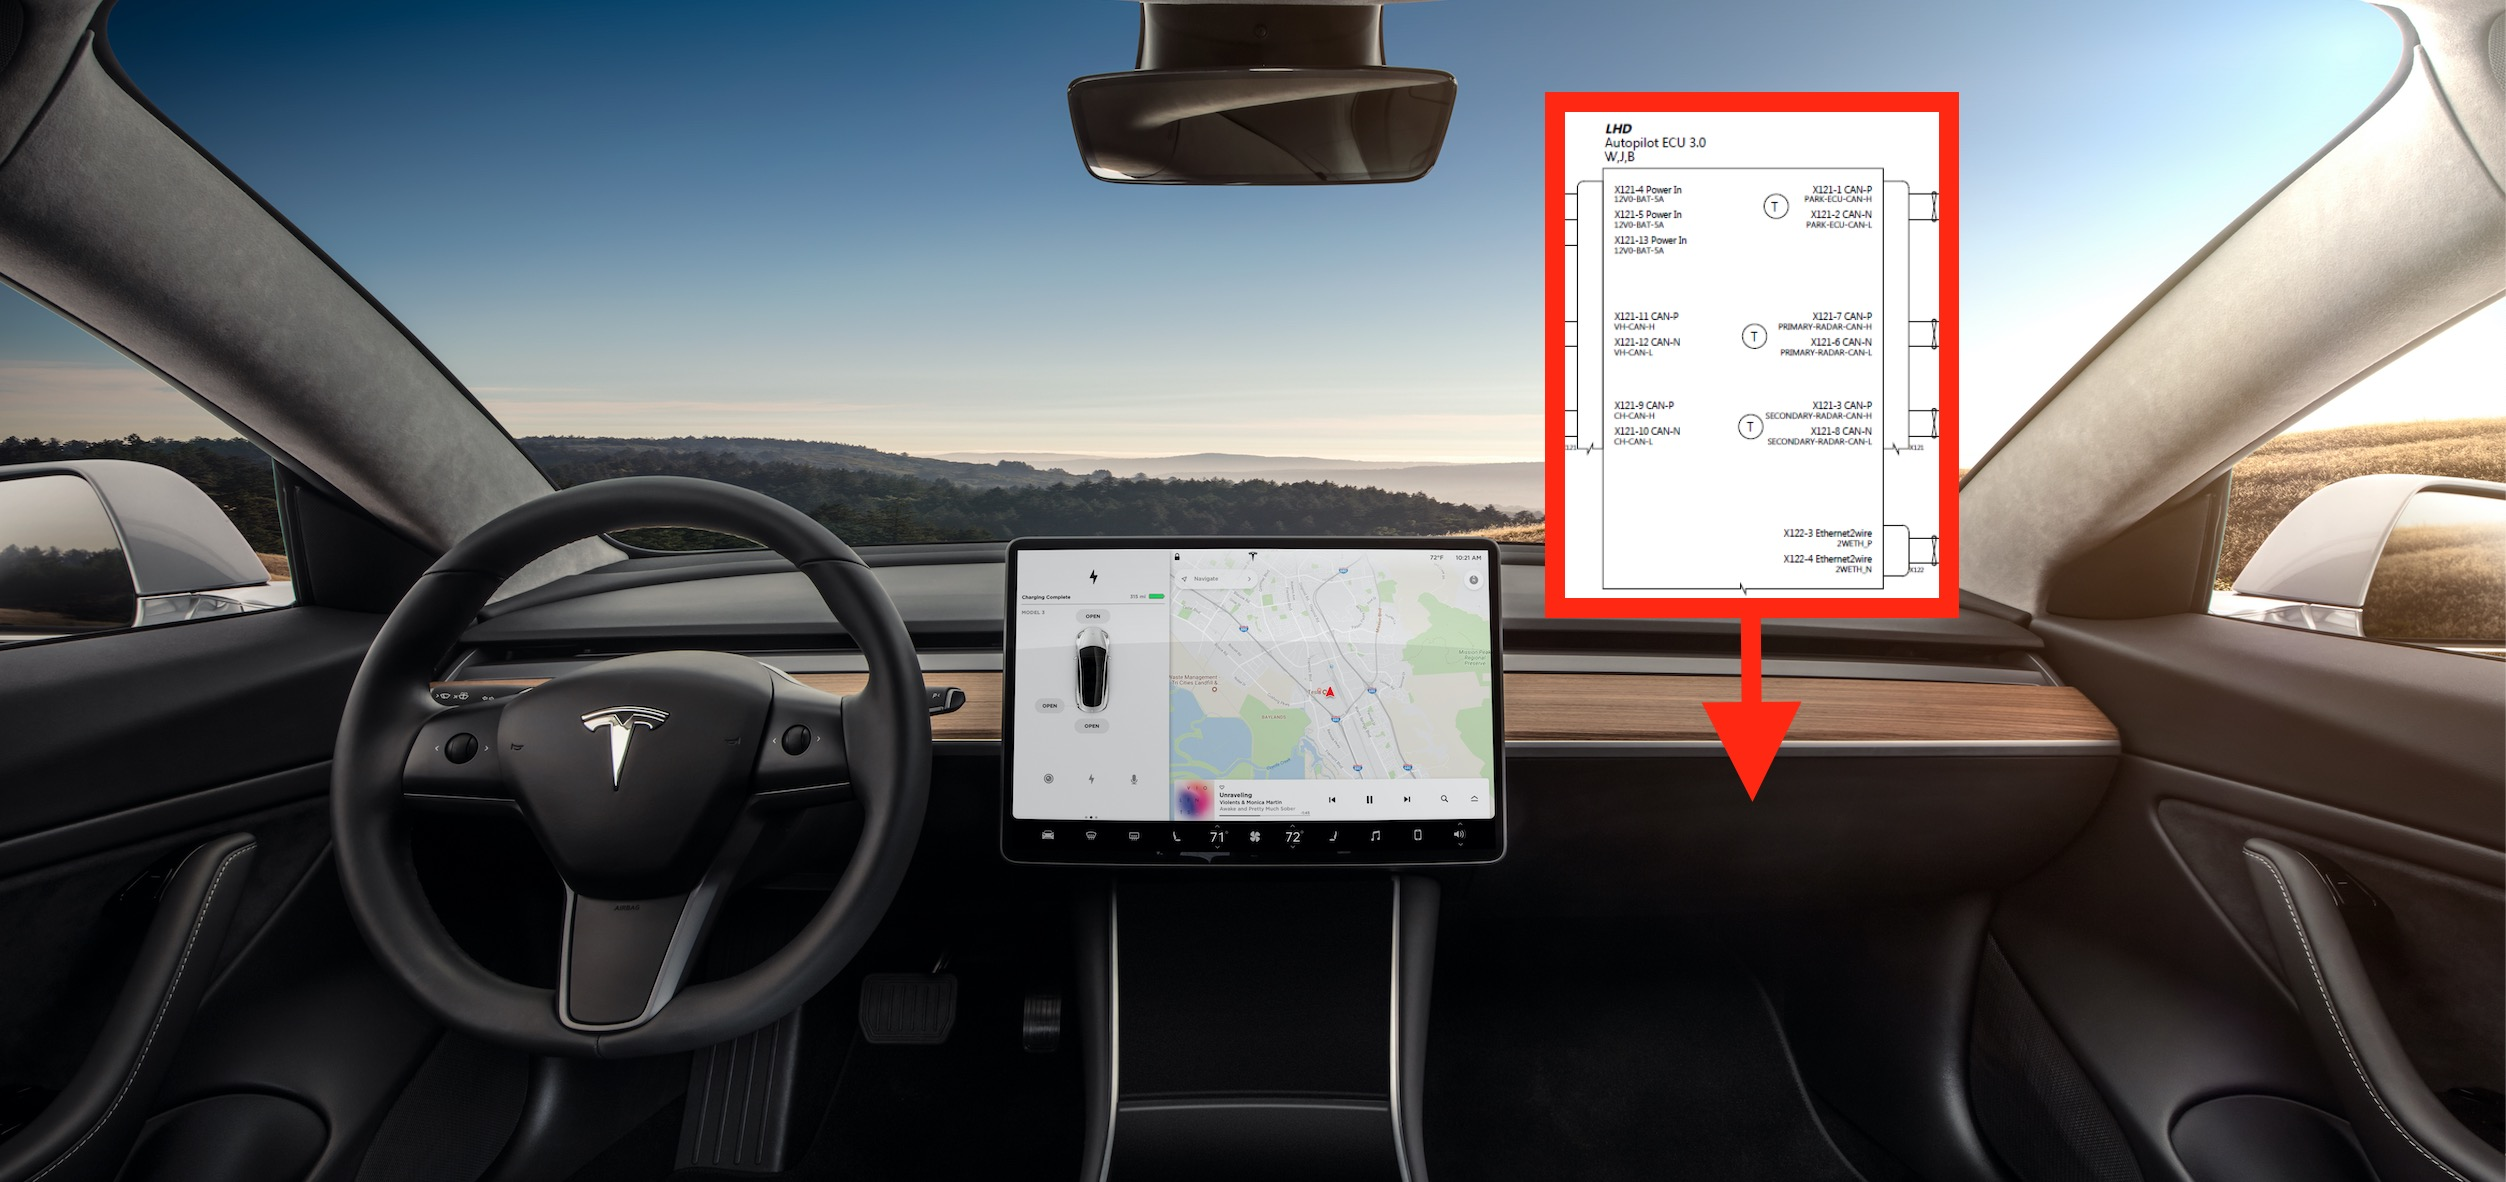 Tesla leaks new self-driving Autopilot hardware 3.0 computer diagram ahead of launch